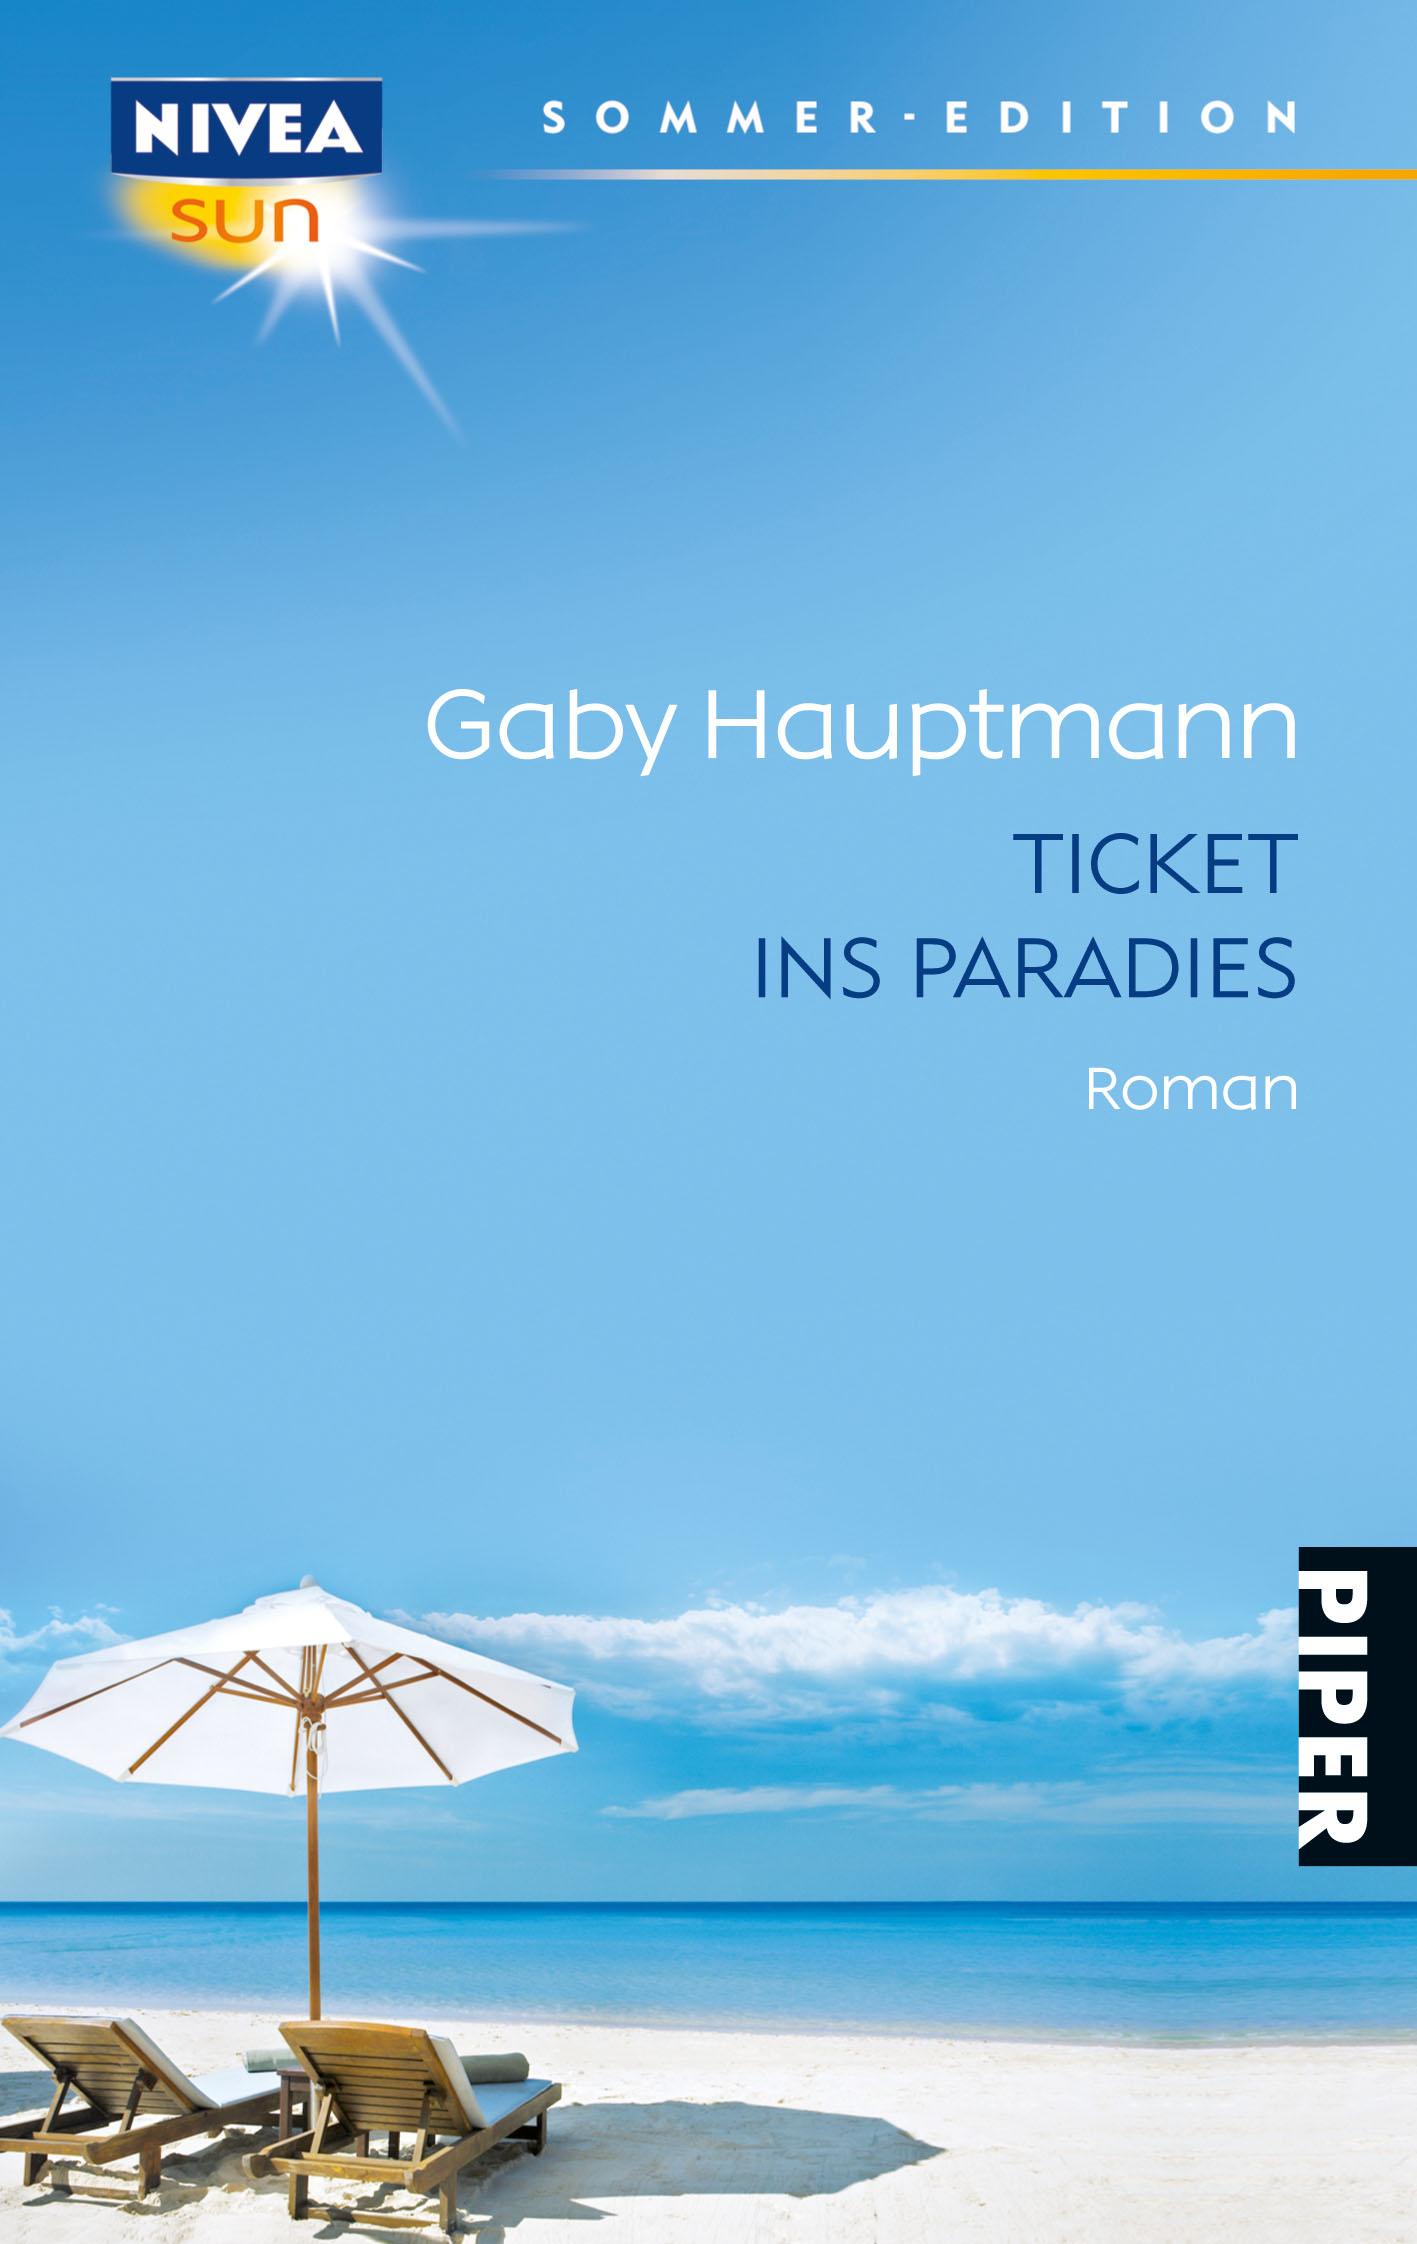 Ticket ins Paradies: Roman - Gaby Hauptmann